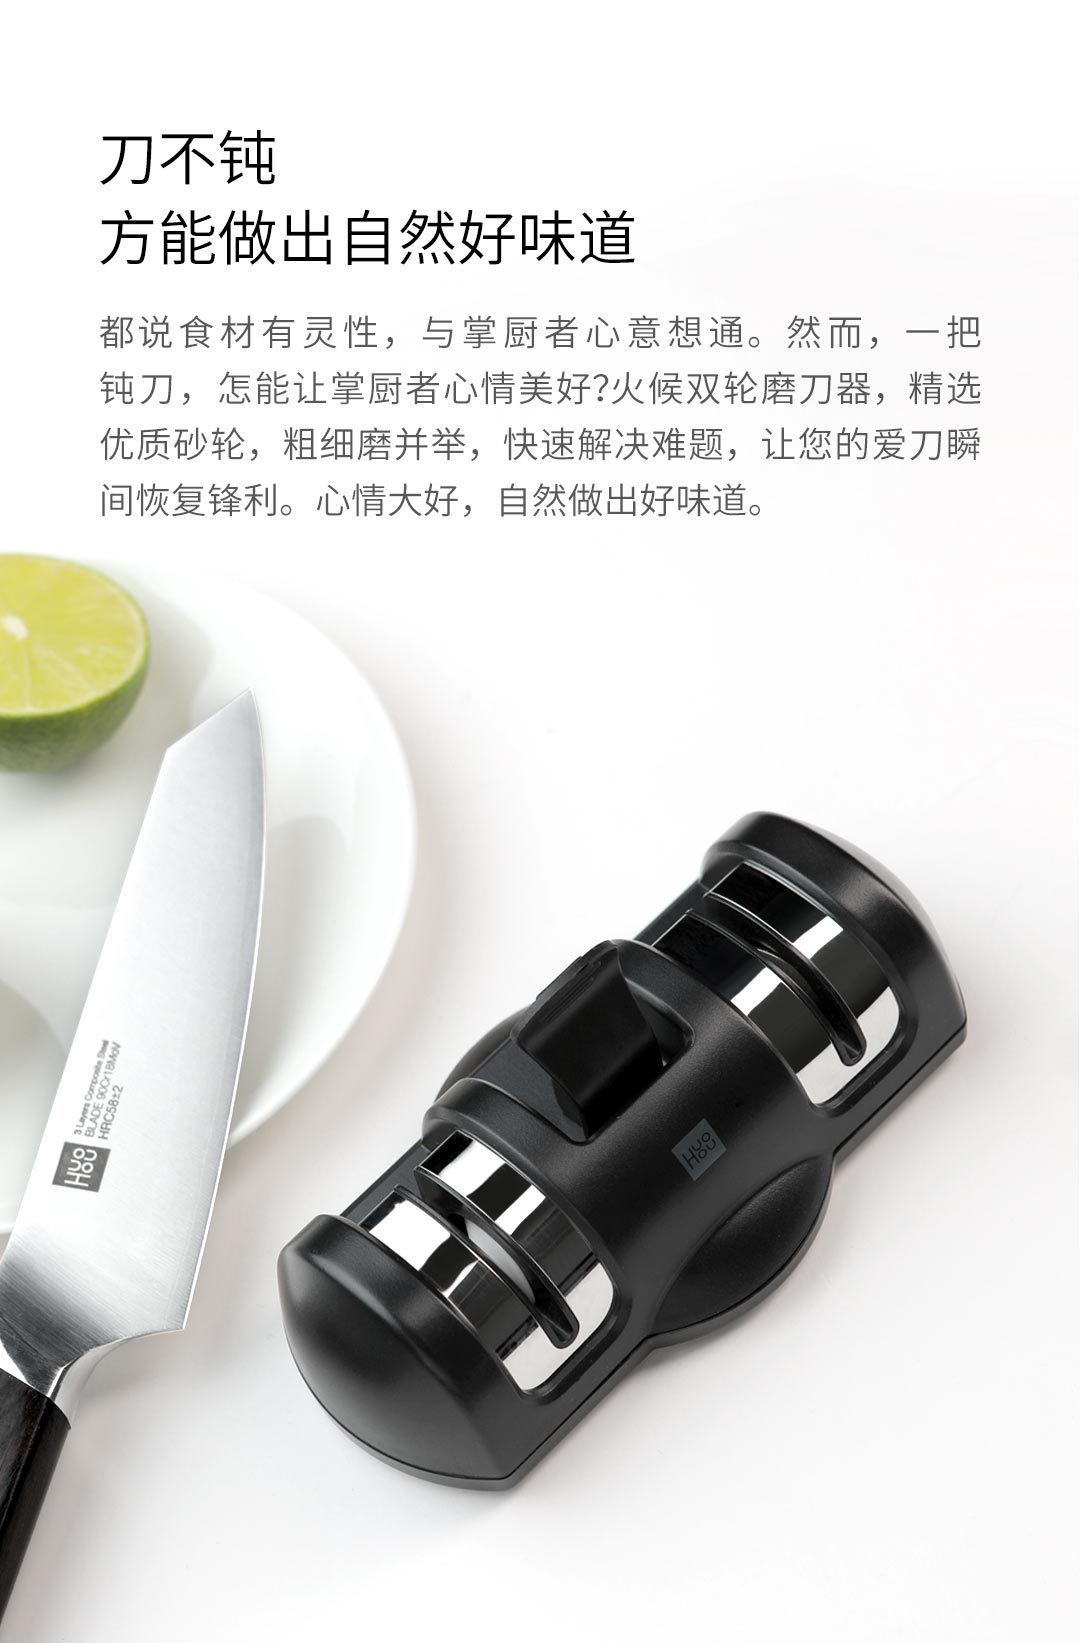 product_奇妙_火候磨刀器